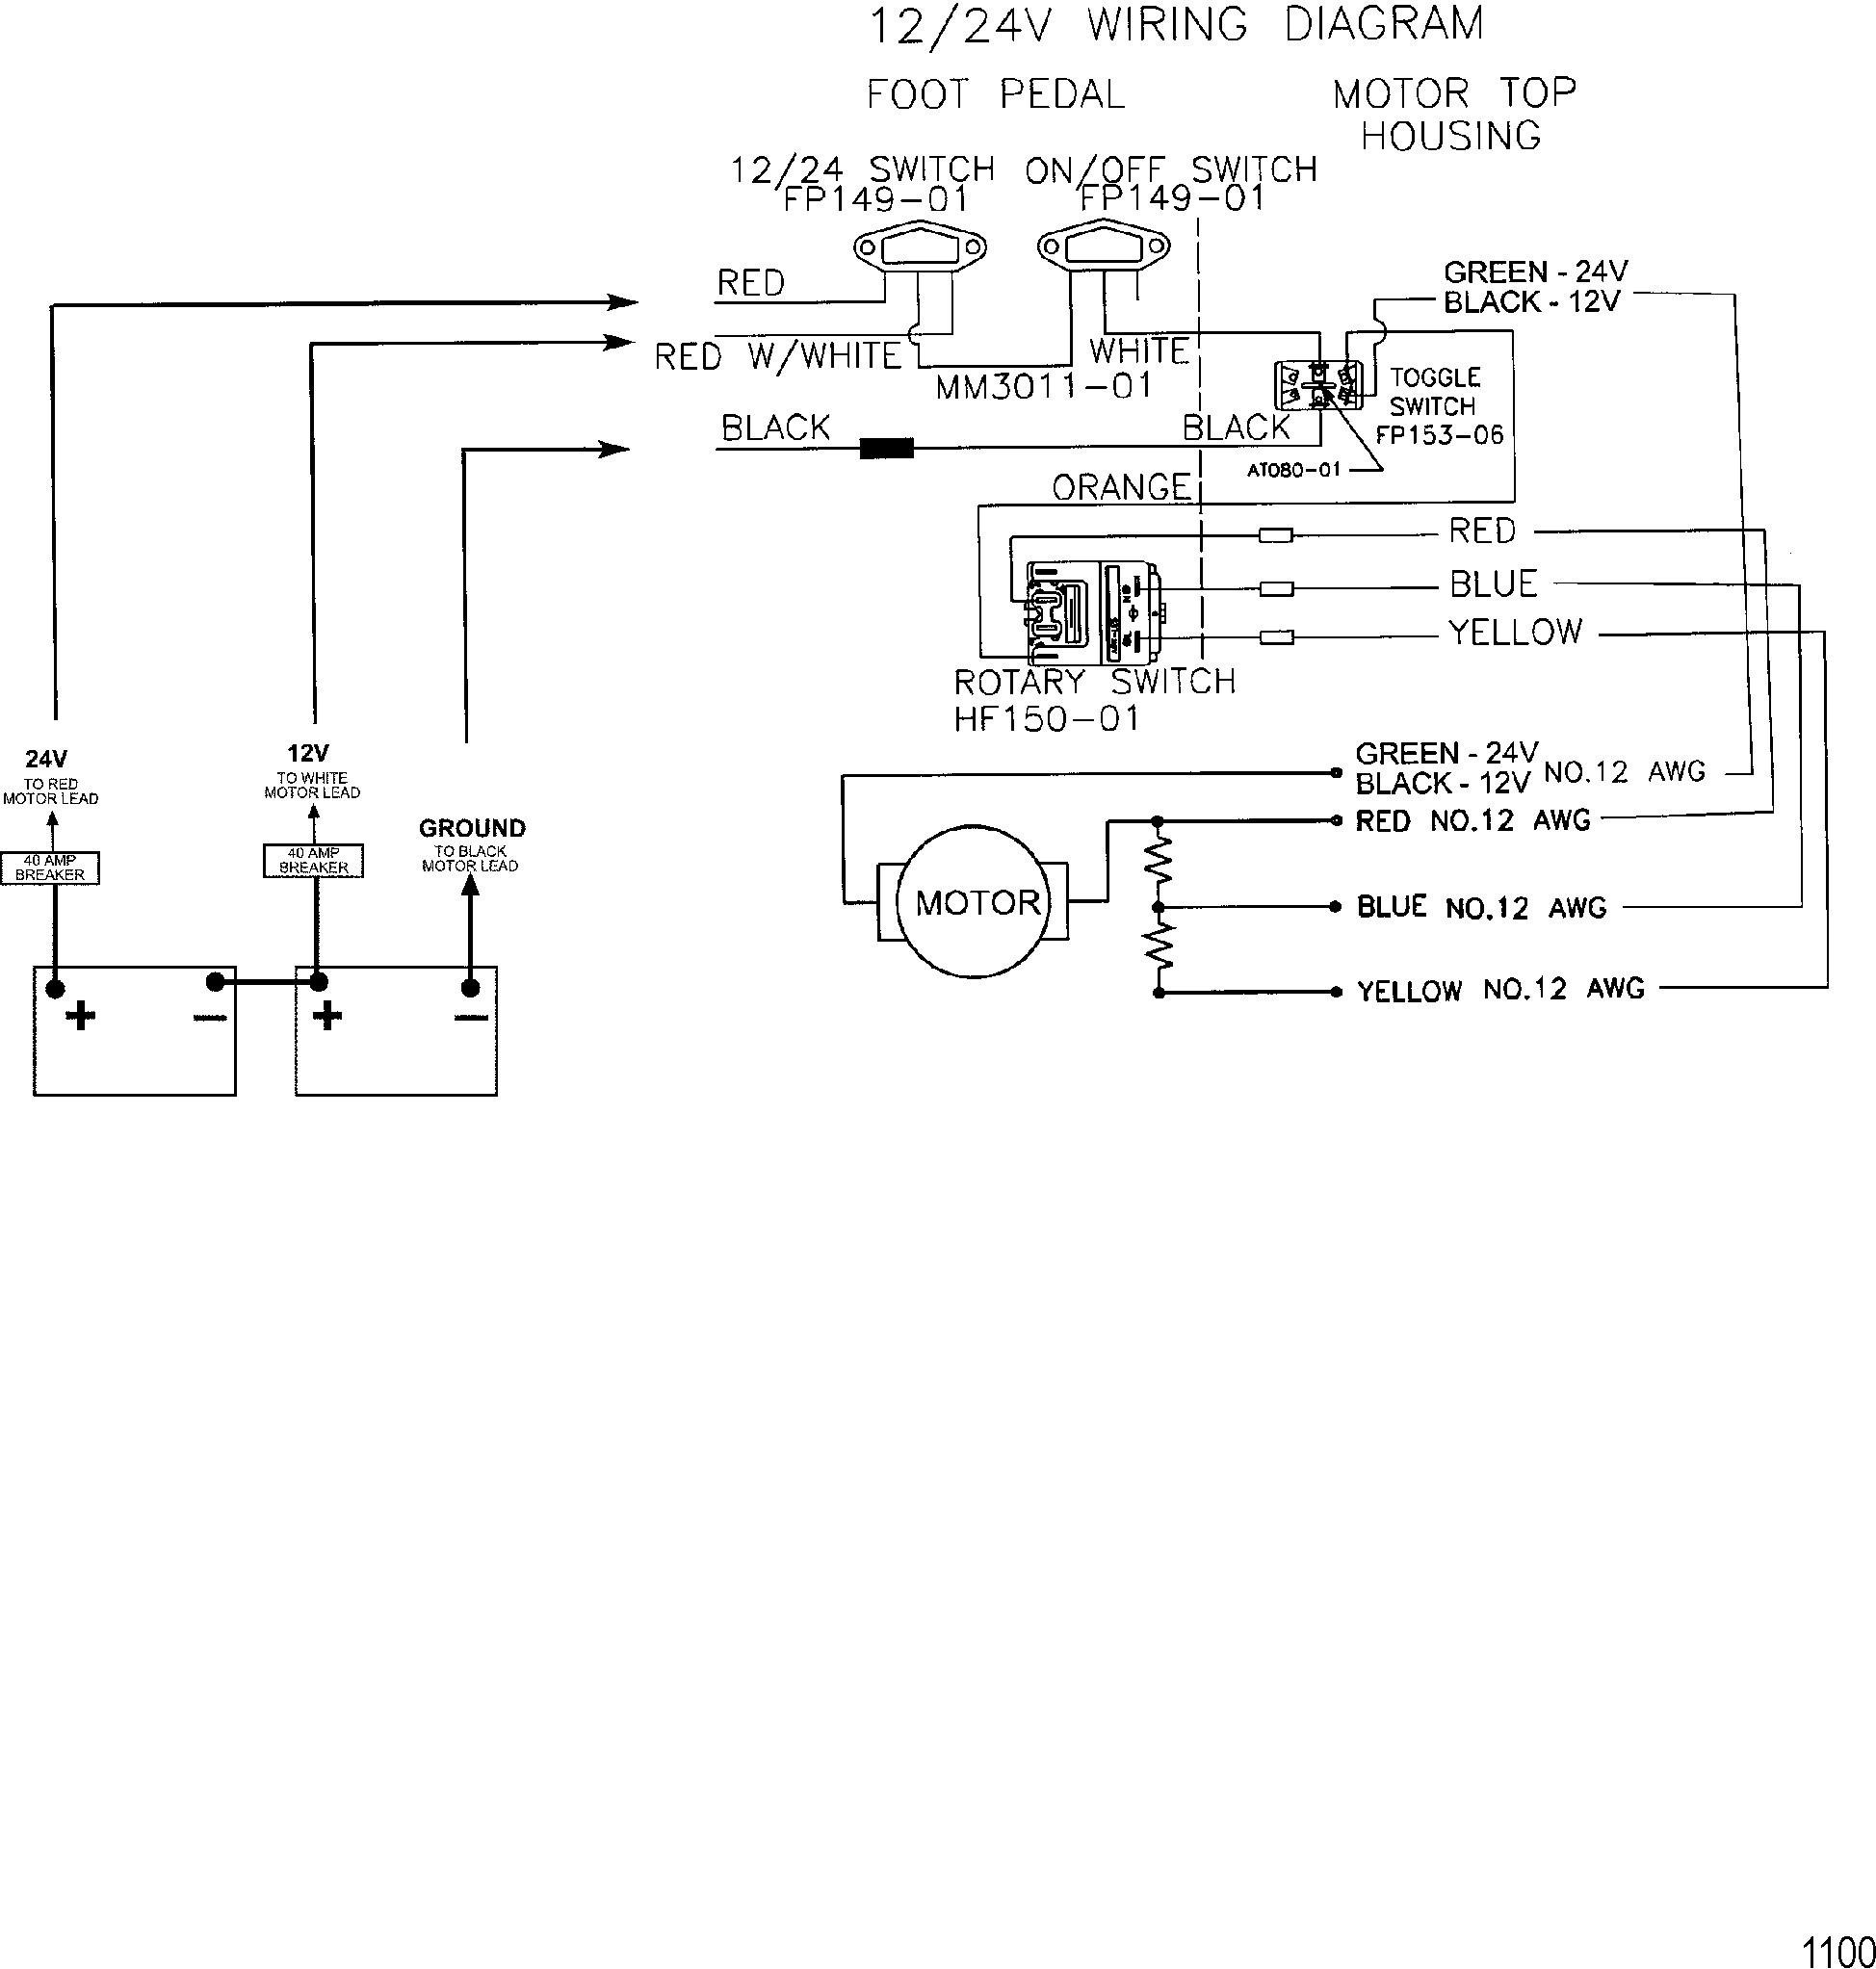 36 Volt Trolling Motor Wiring Diagram | Wiring Diagram - Motorguide Trolling Motor Wiring Diagram